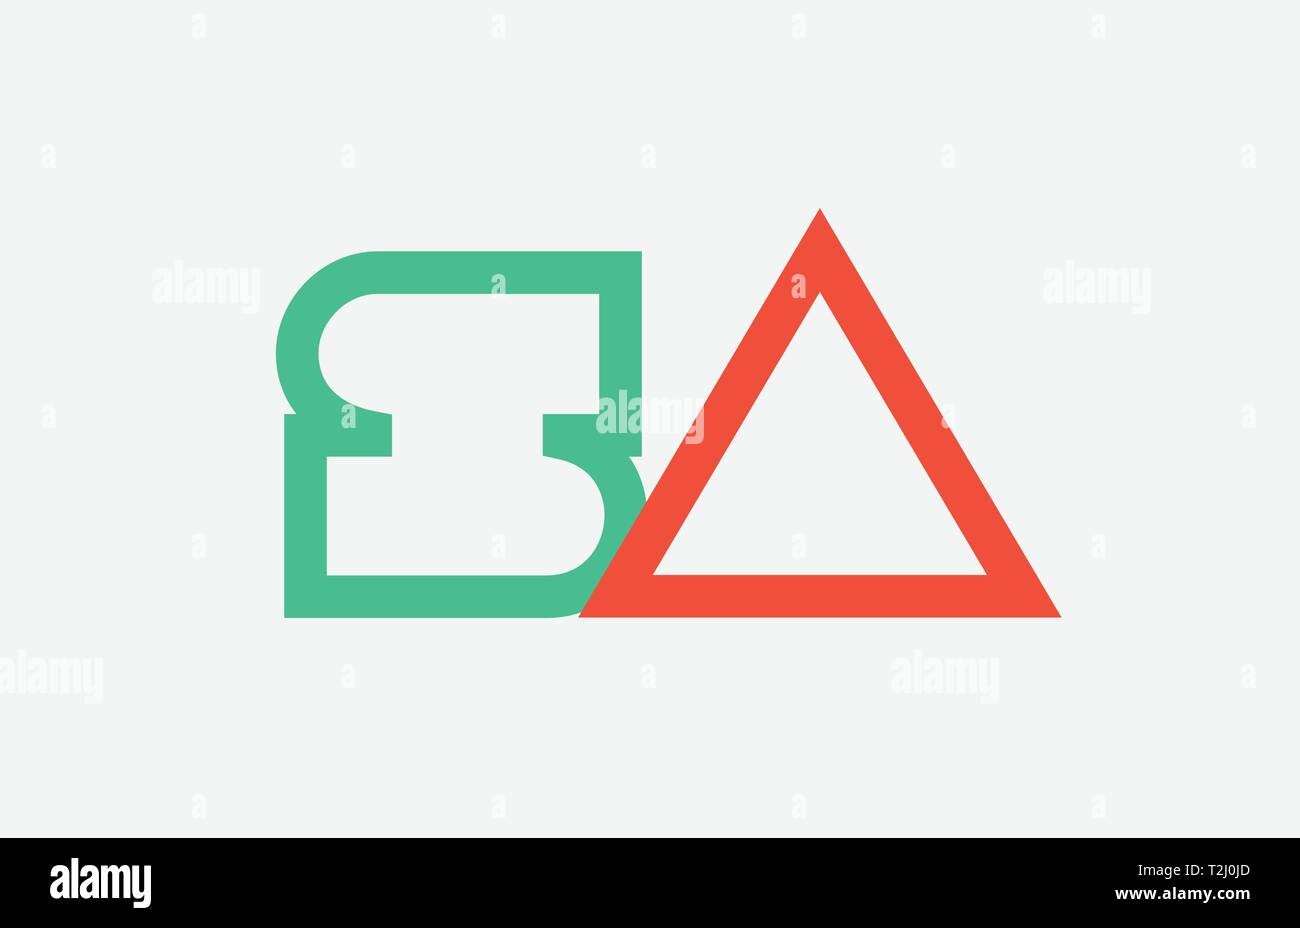 orange green alphabet letter logo combination sa s a design suitable for a company or business - Stock Vector